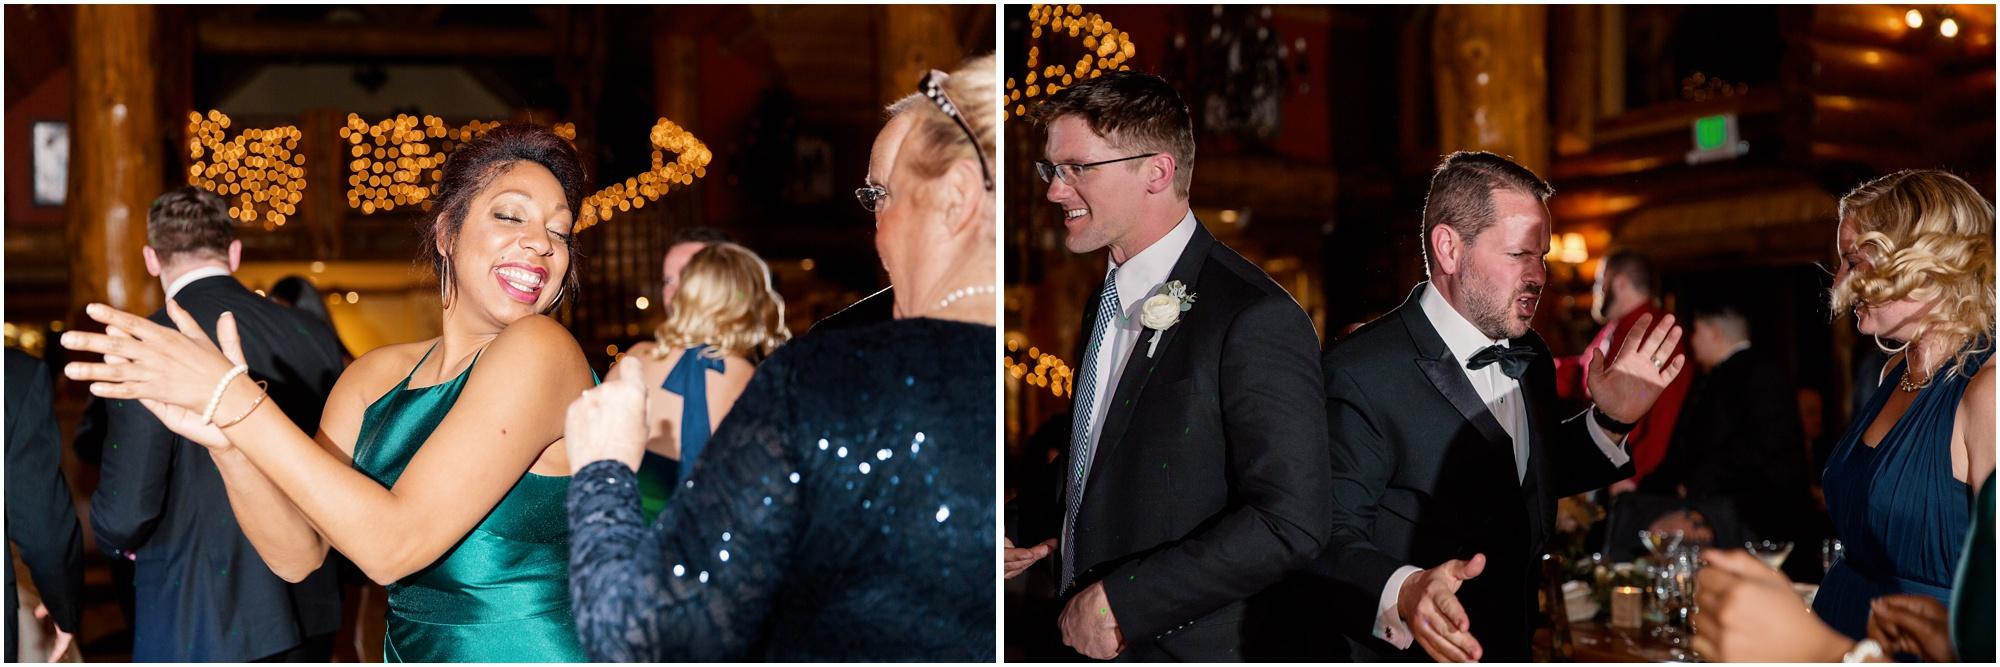 Breckenridge-Wedding-Photographer_0062.jpg